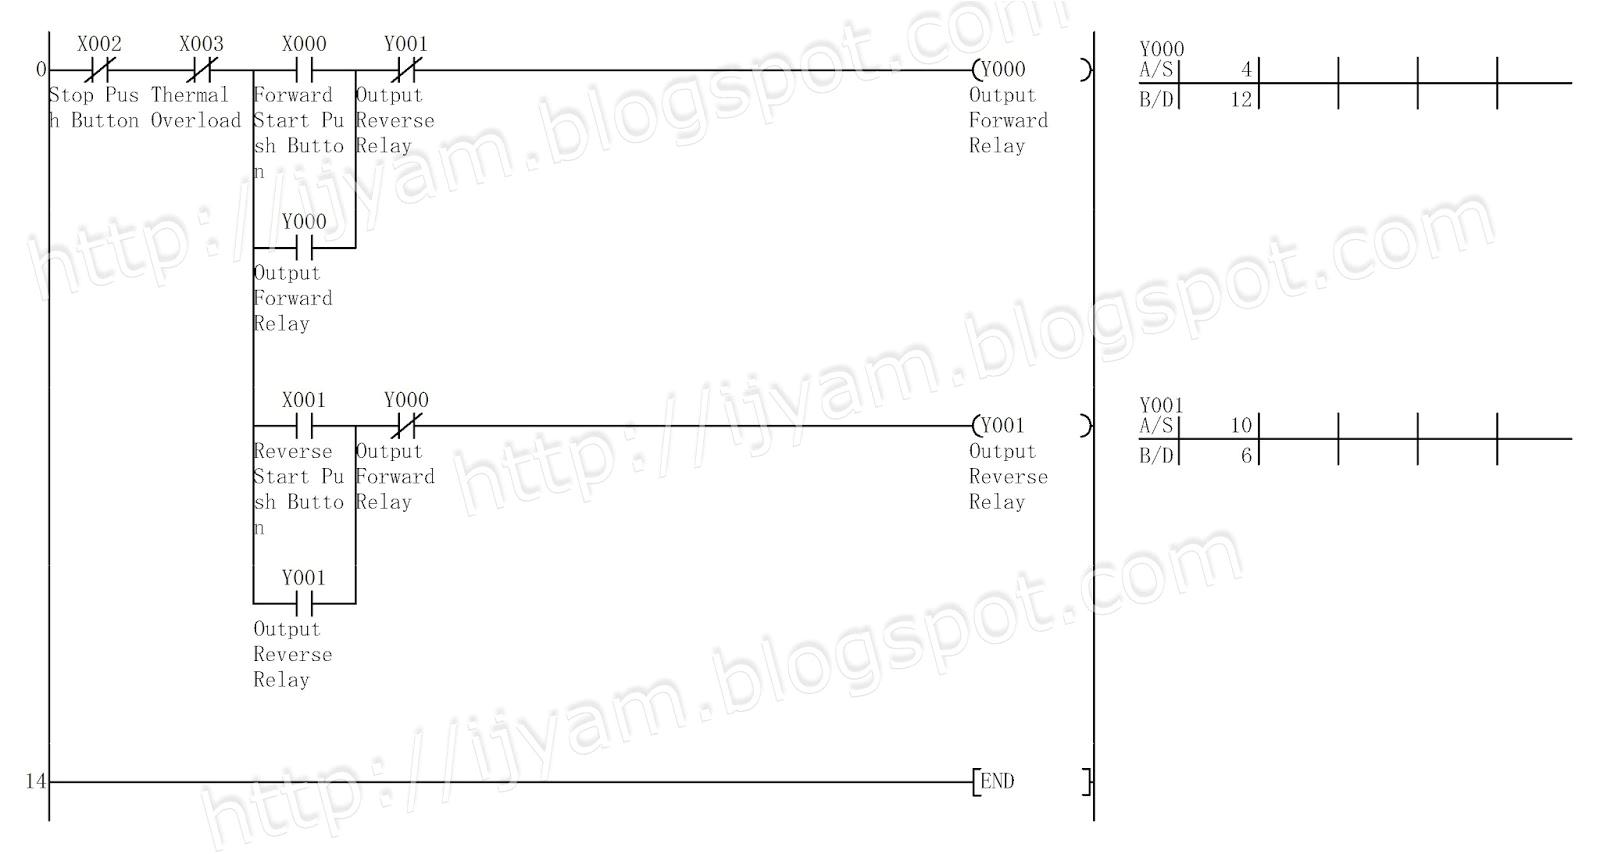 mitsubishi plc ladder logic program for the forward reverse motor control circuit electrical wiring diagram